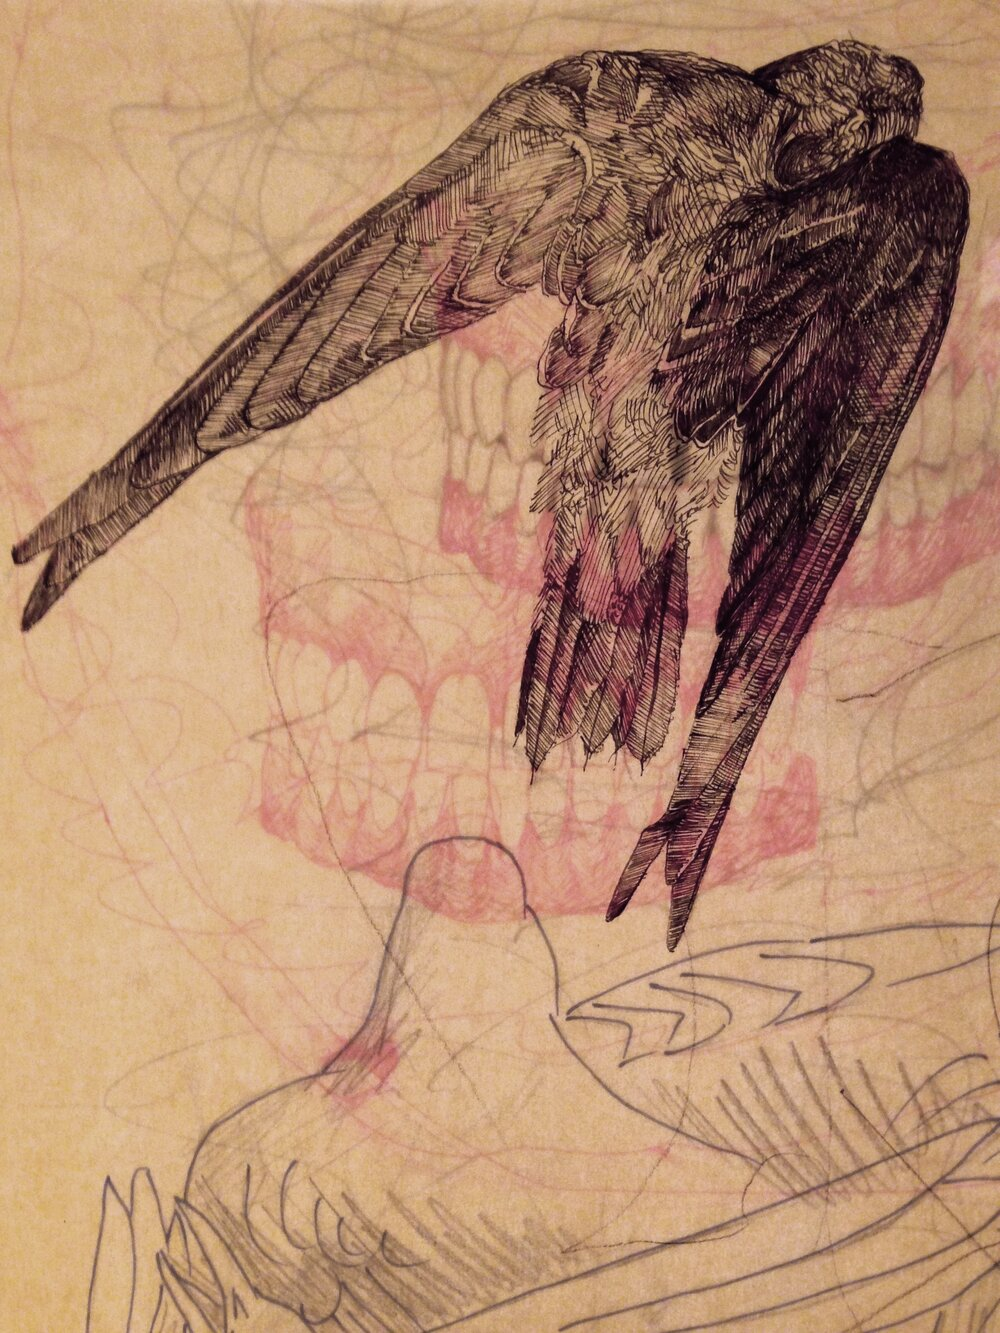 Katherine Rutecki,  Torso,  ink, graphite on tracing paper, glass plate, 30x93cm, 2015 (detail)